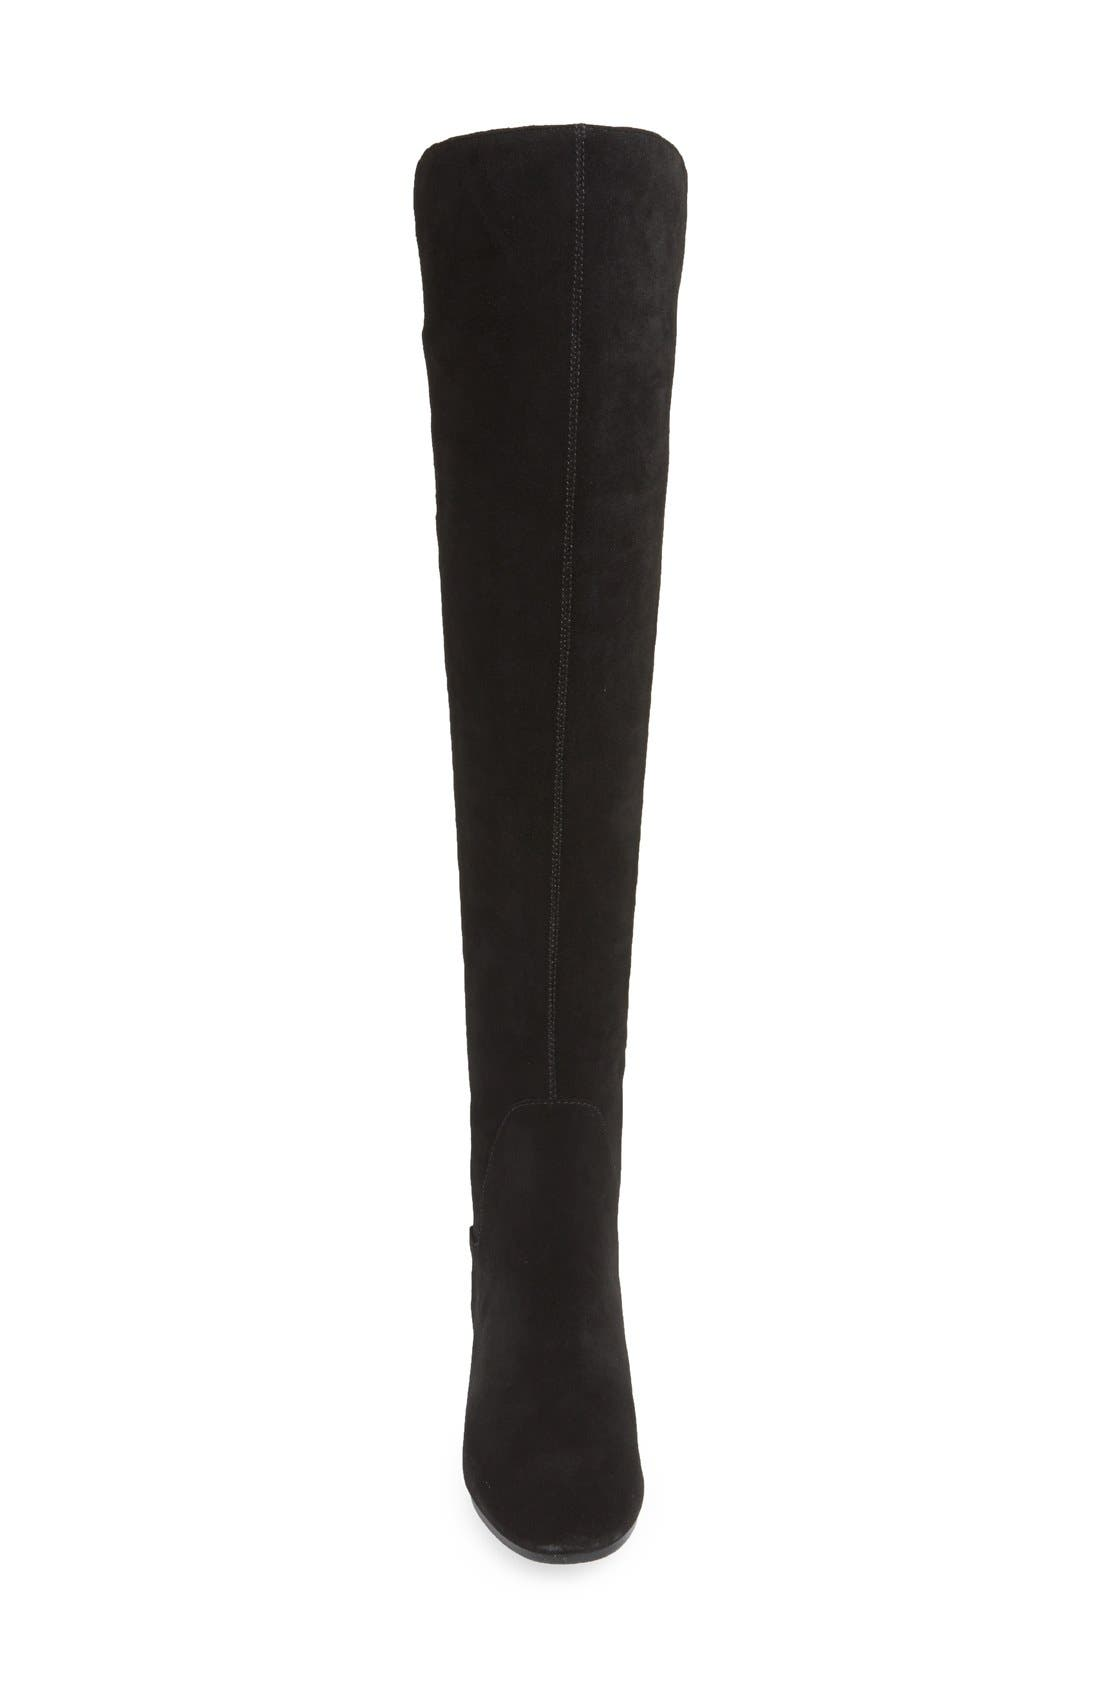 Alternate Image 3  - Nine West 'Tiberia' Over the Knee Boot (Women)